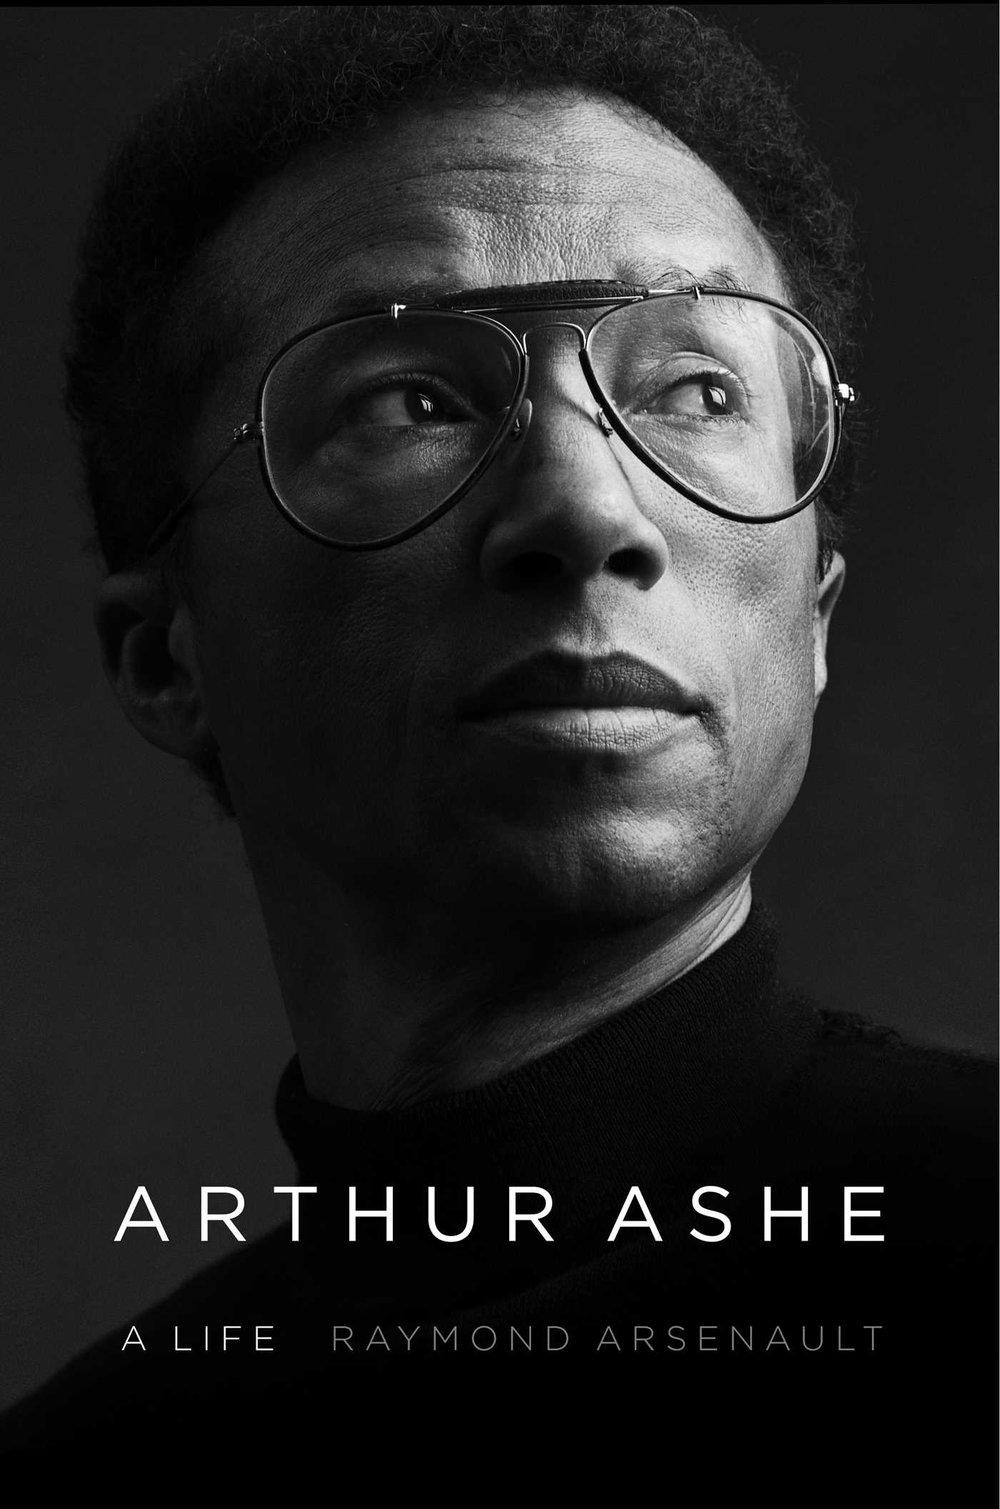 arthur-ashe-9781439189047_hr.jpg